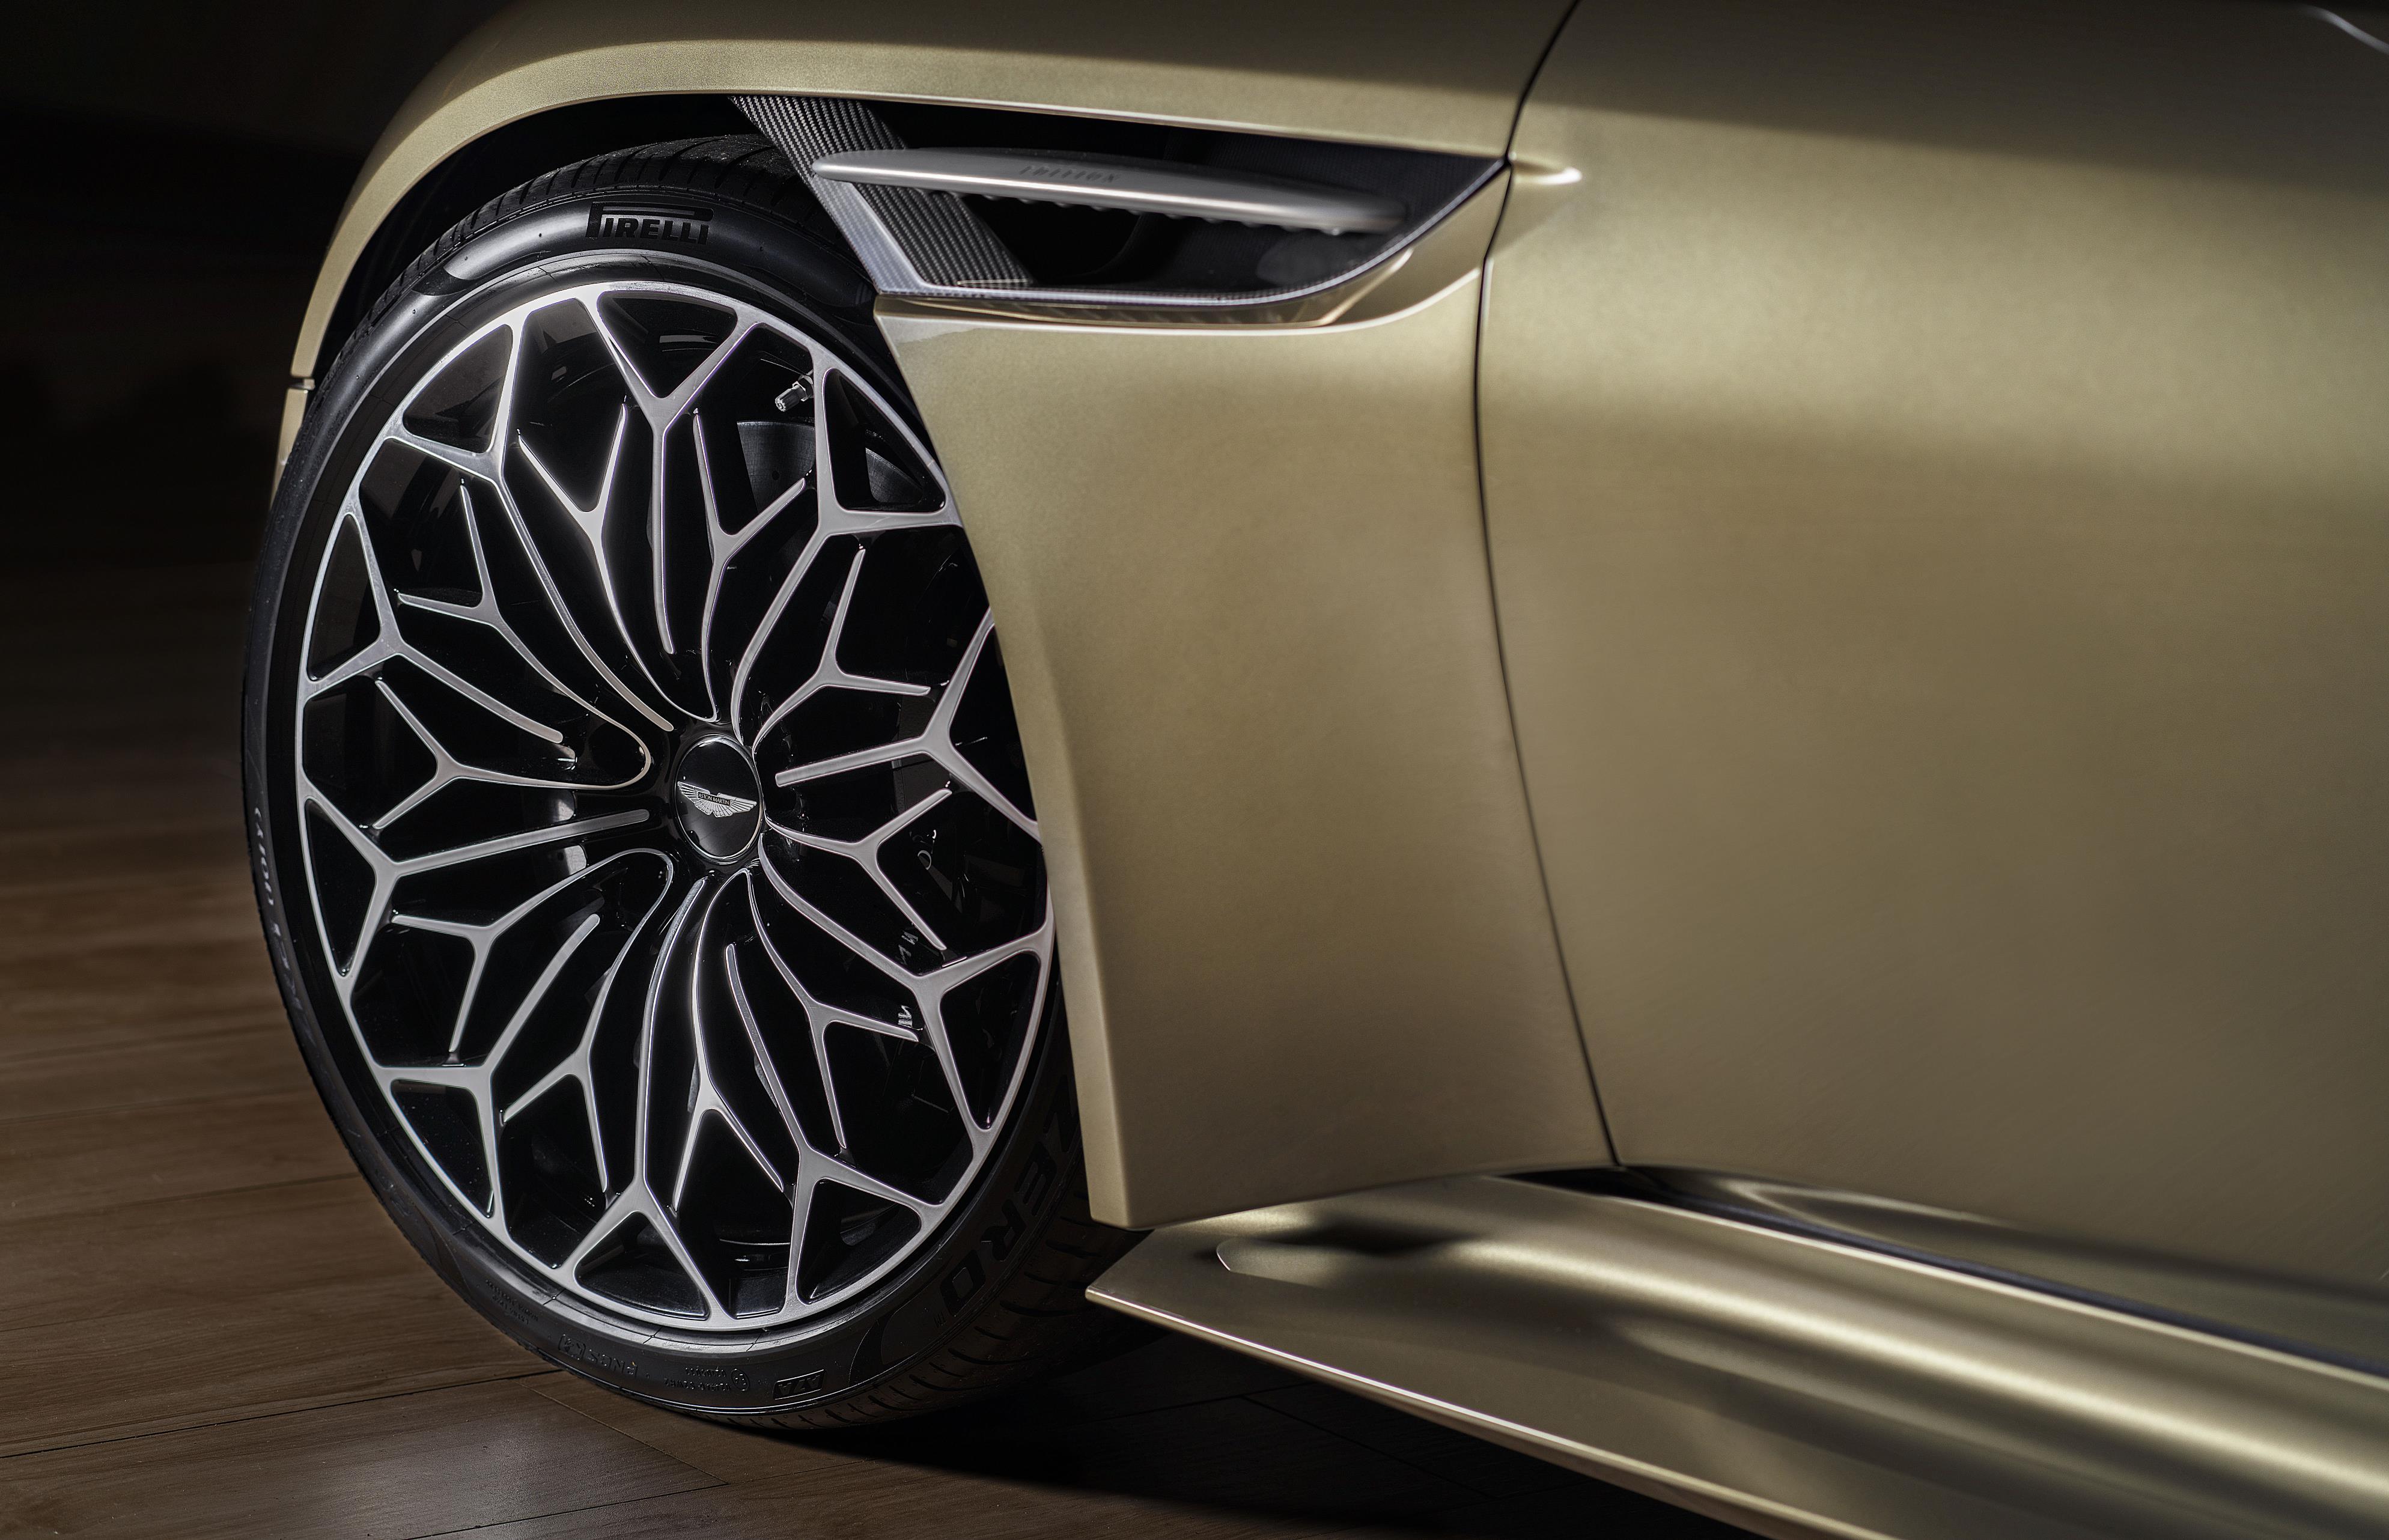 Olive Green Aston Martin DBS Superleggera Wheels